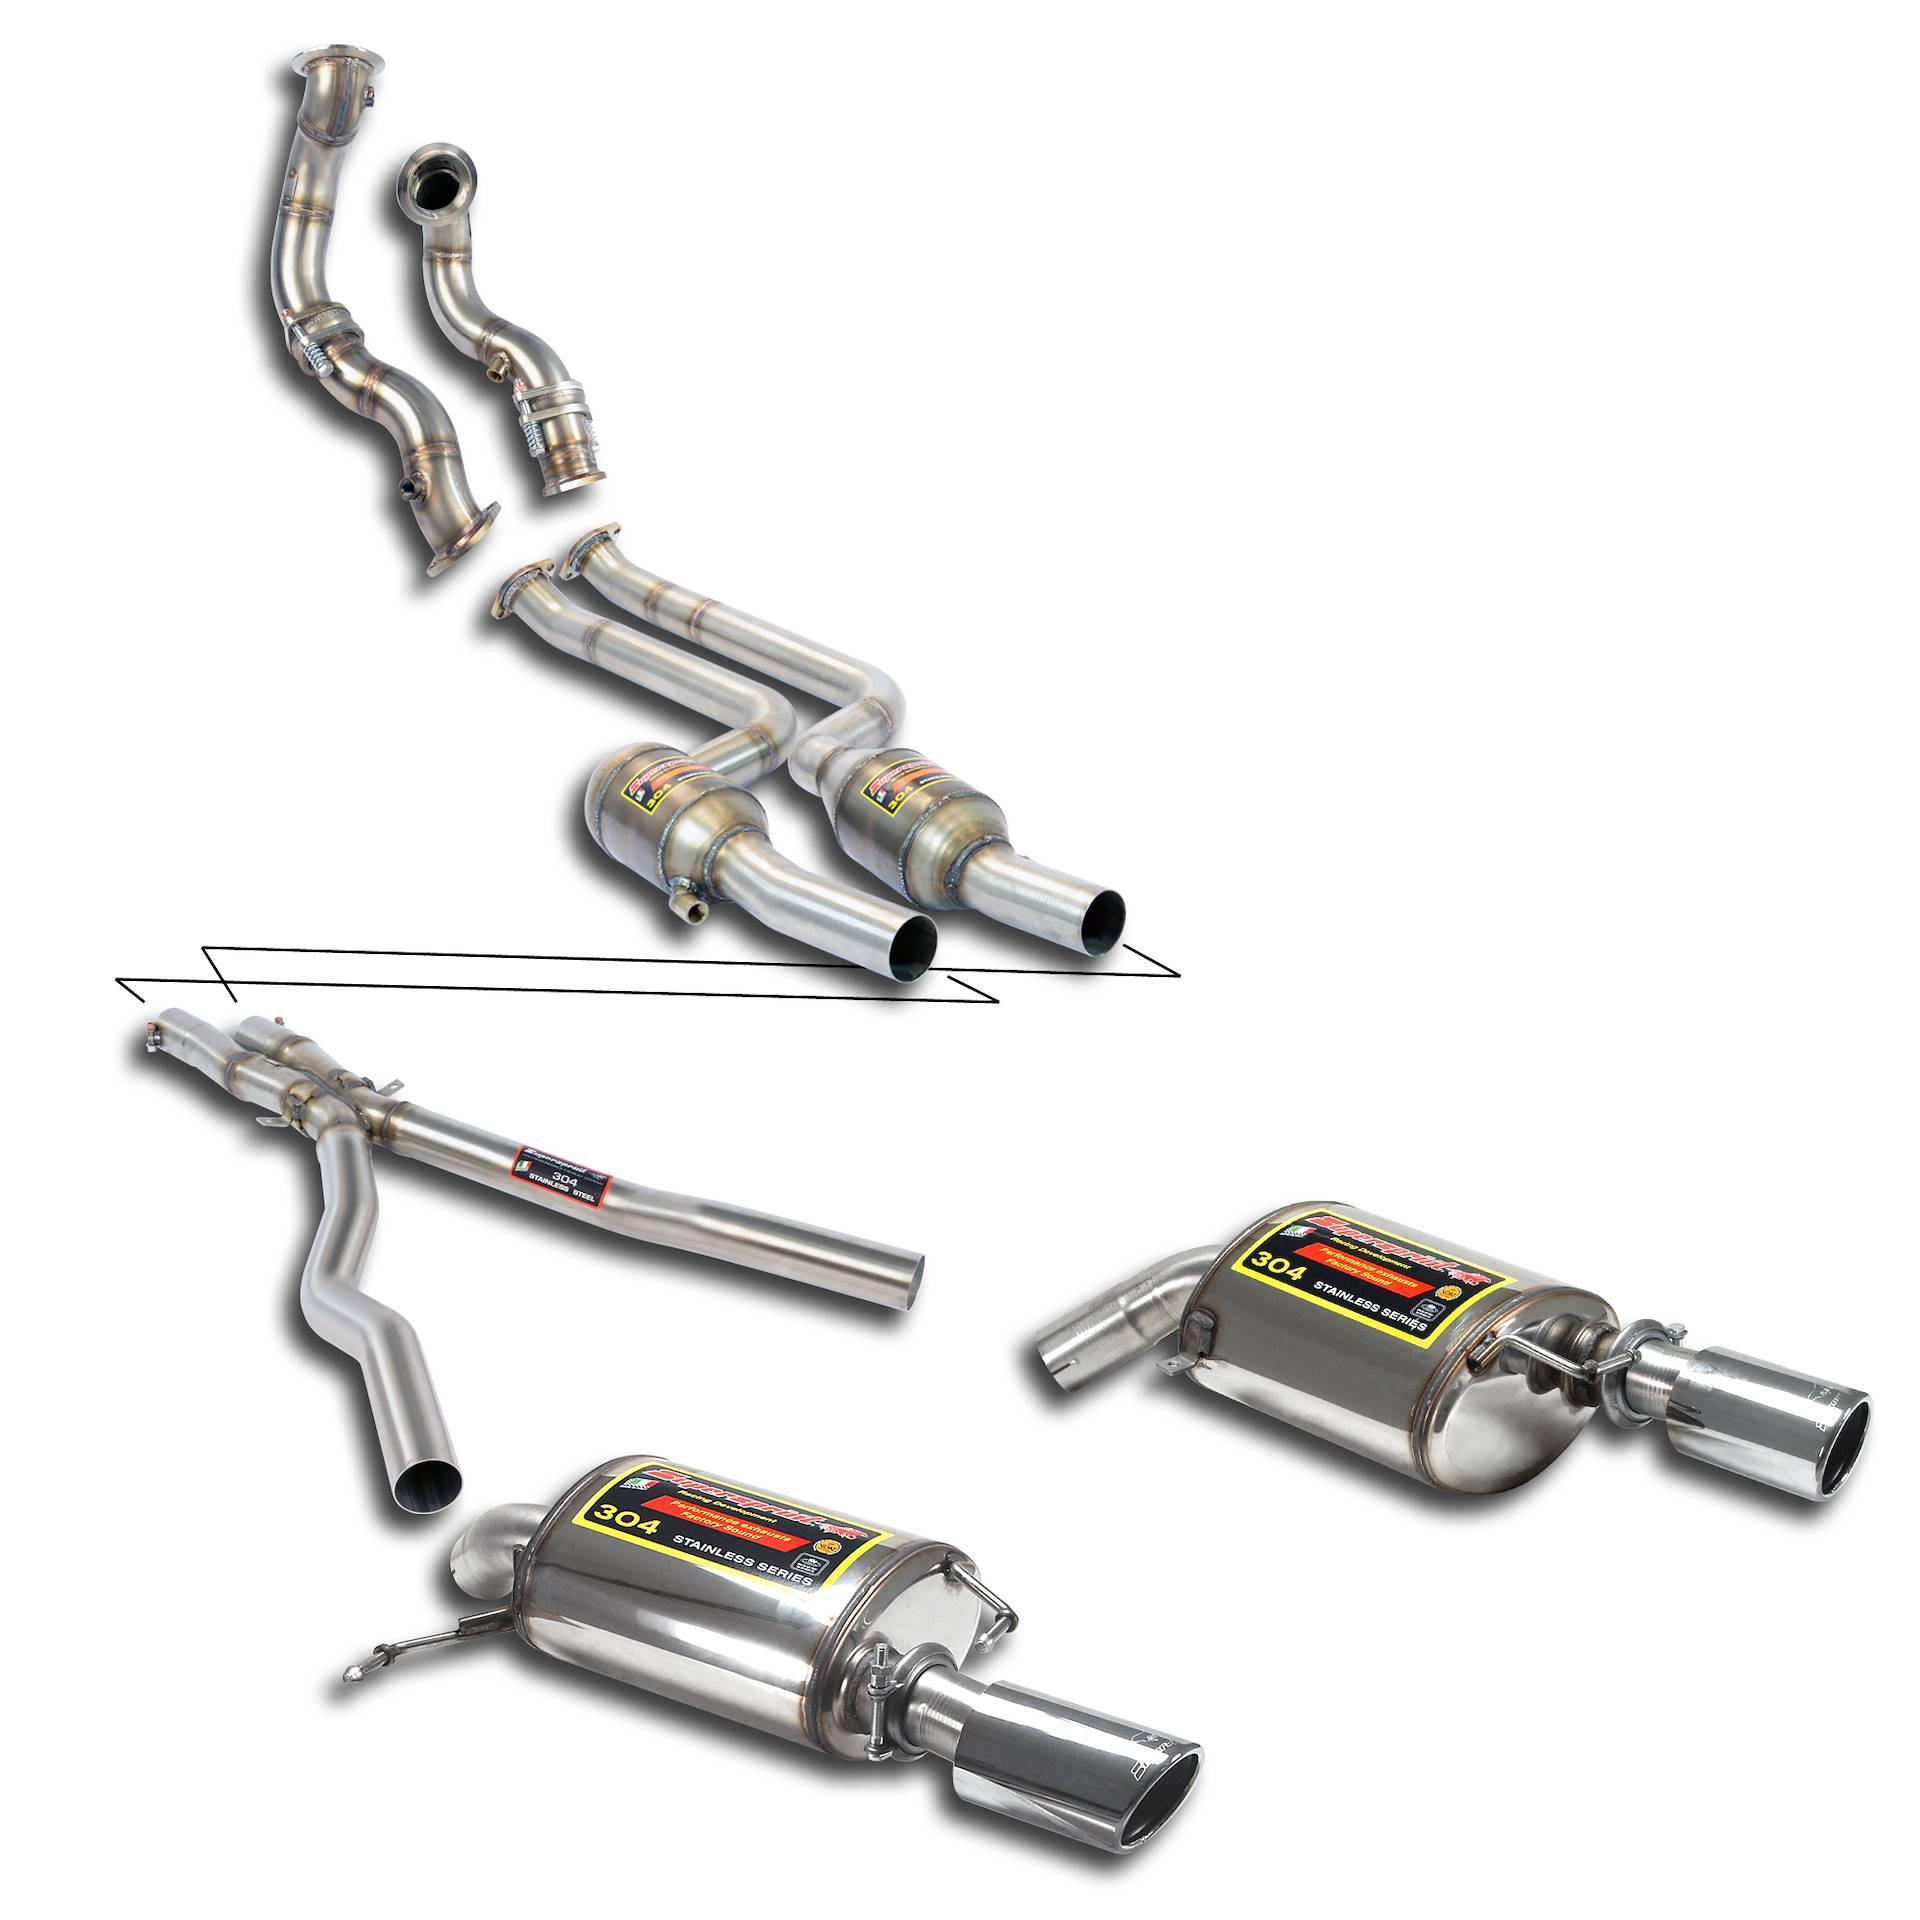 Bmw Z4 E89 Exhaust: Performance Sport Exhaust For Z4 SDrive35is, BMW E89 Z4